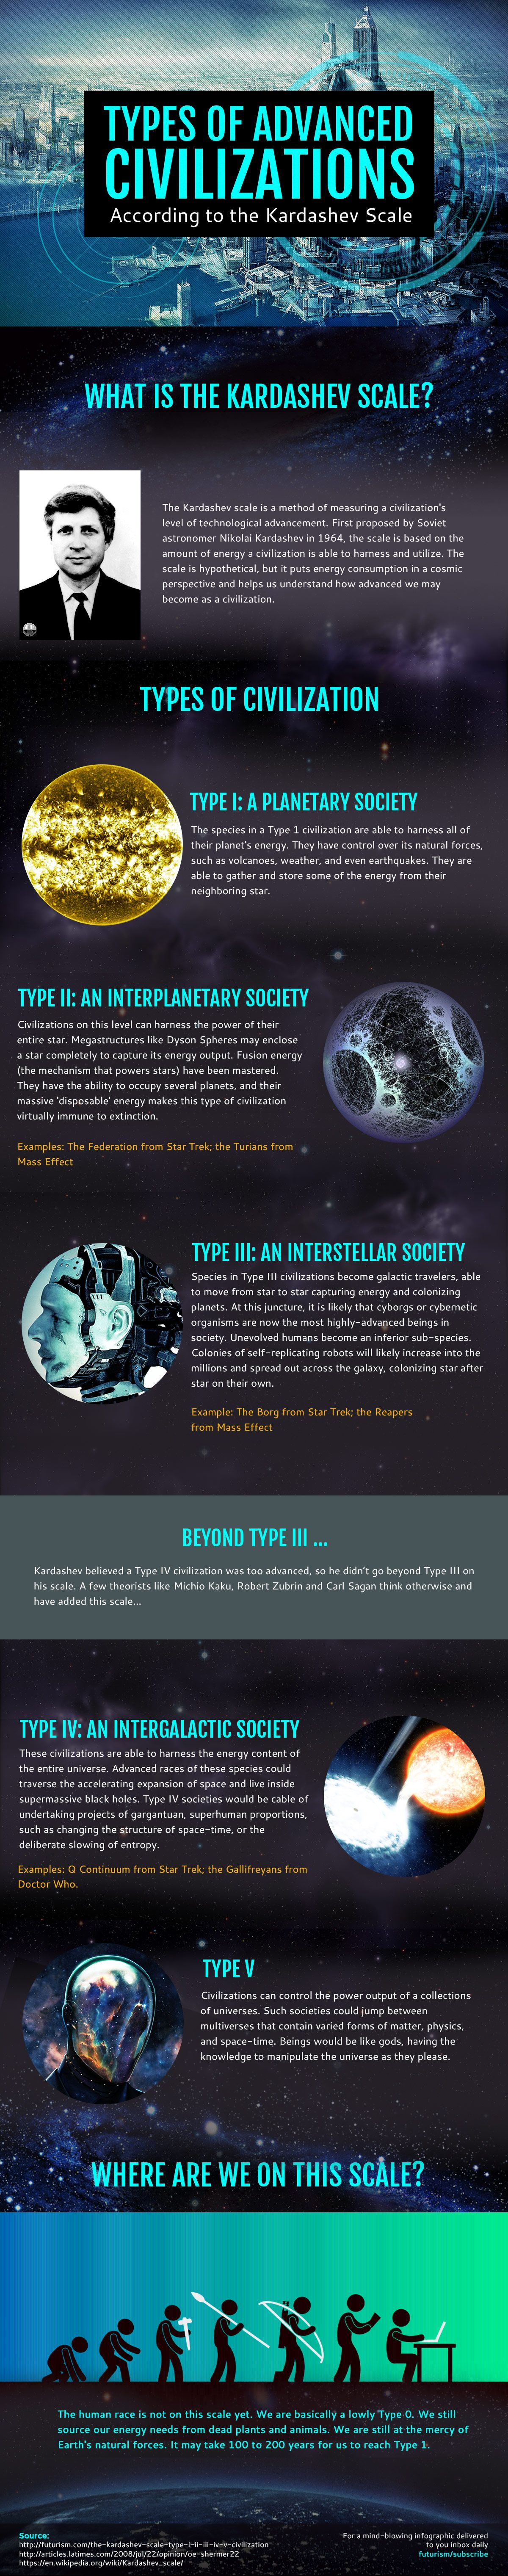 Kardashev Scale: The Kinds of Alien Civilizations in Our Universe - https://en.wikipedia.org/wiki/Kardashev_scale - http://futurism.com/images/kardashev-scale-the-kinds-of-alien-civilizations-in-our-universe/